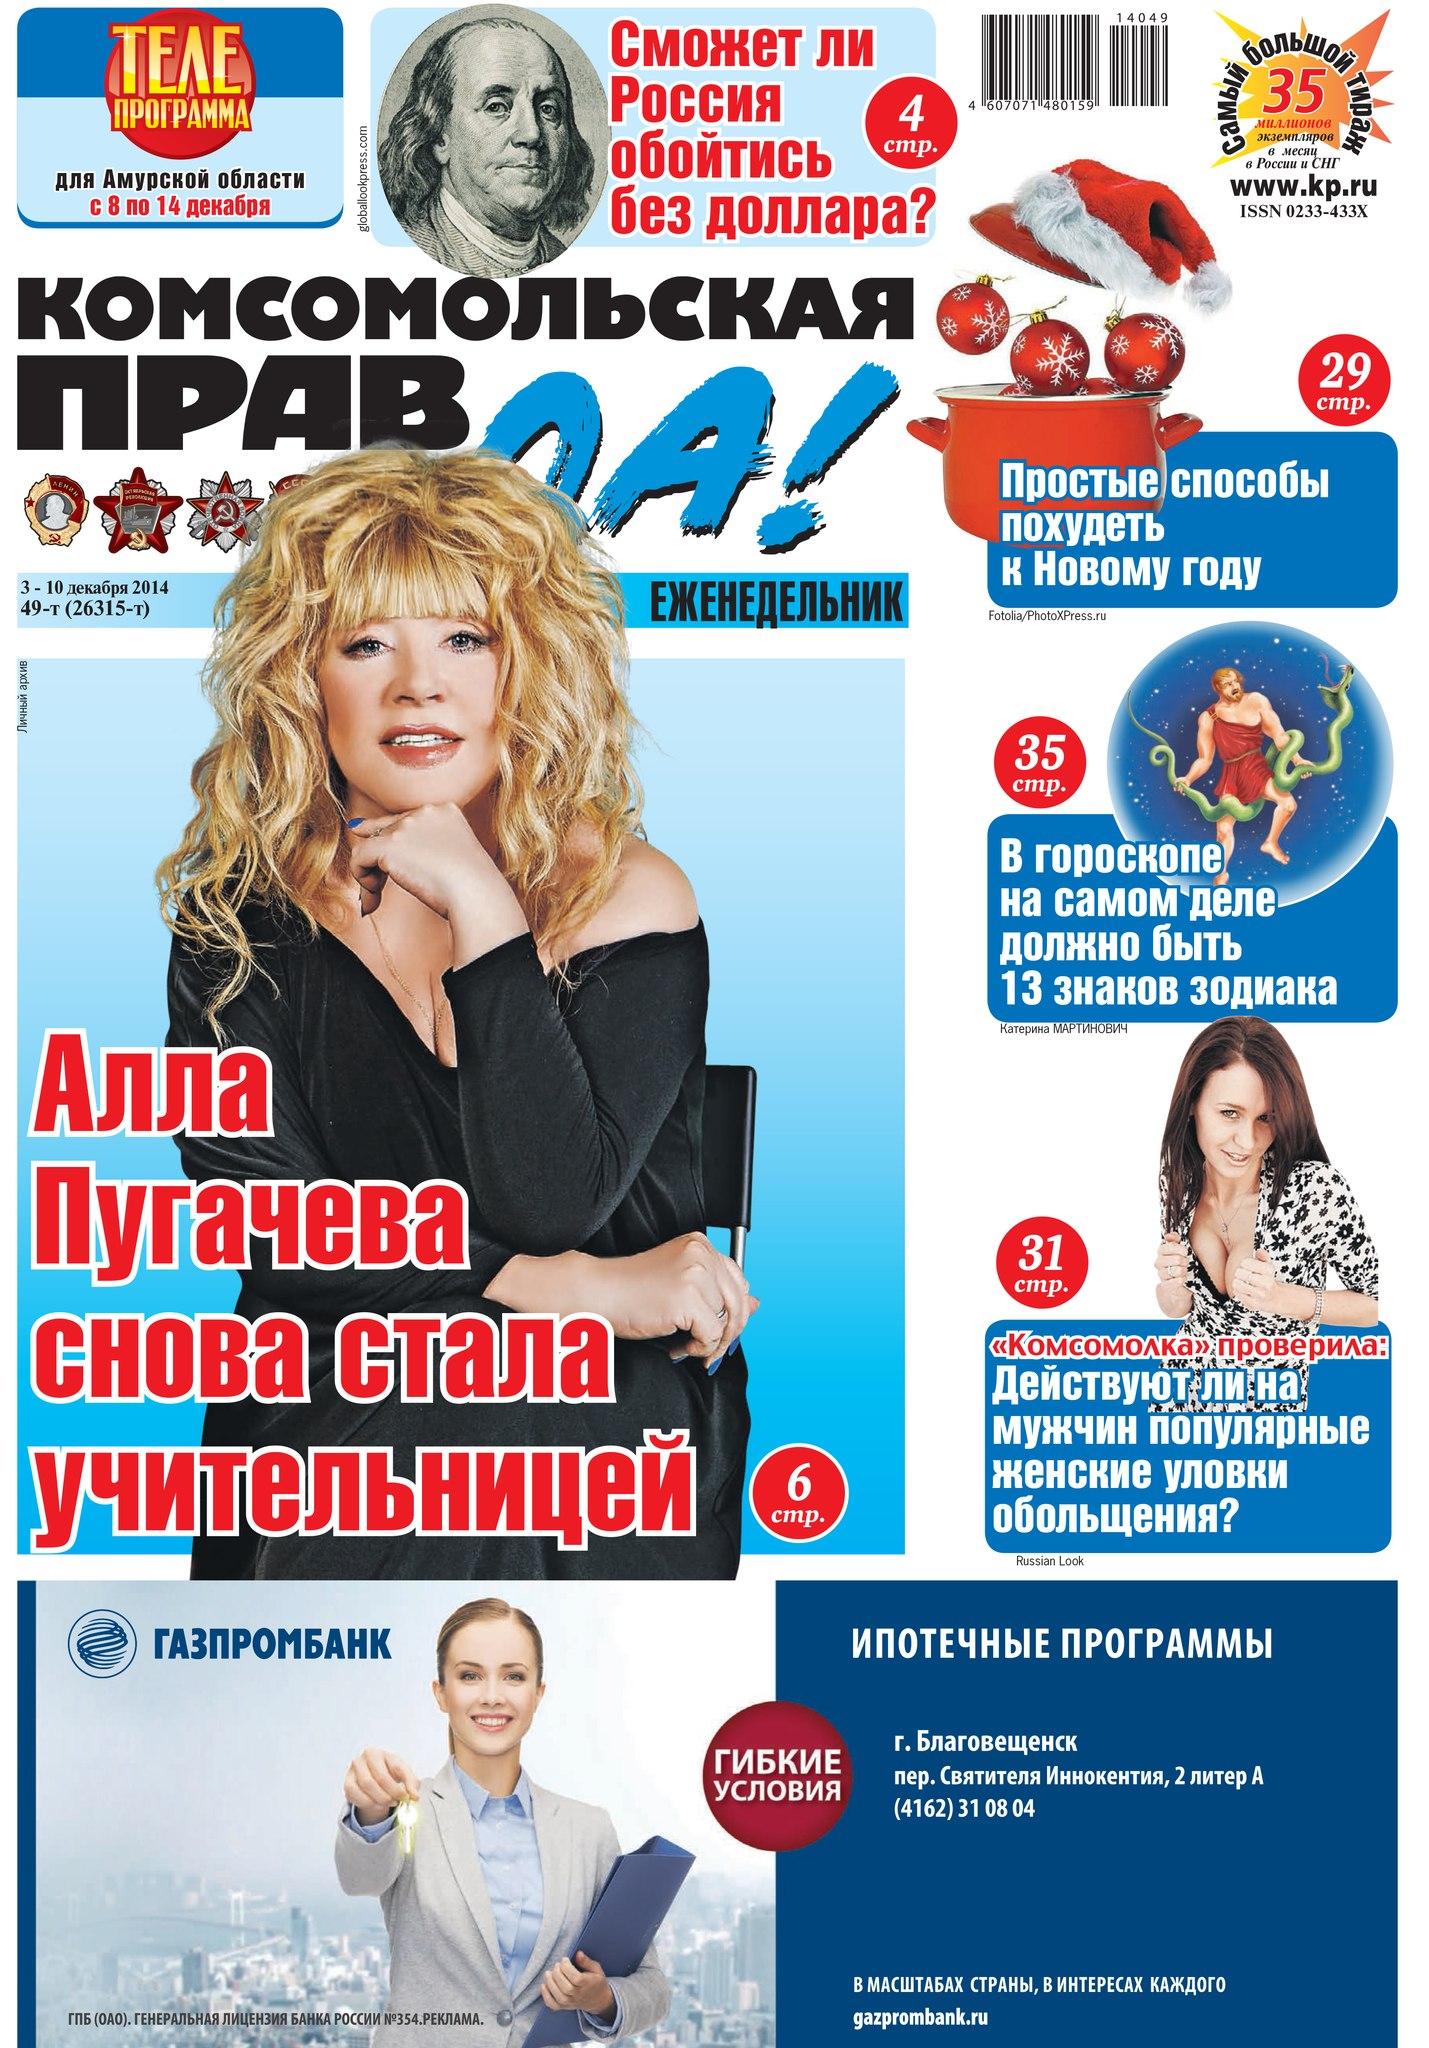 http://sa.uploads.ru/Psu8d.jpg